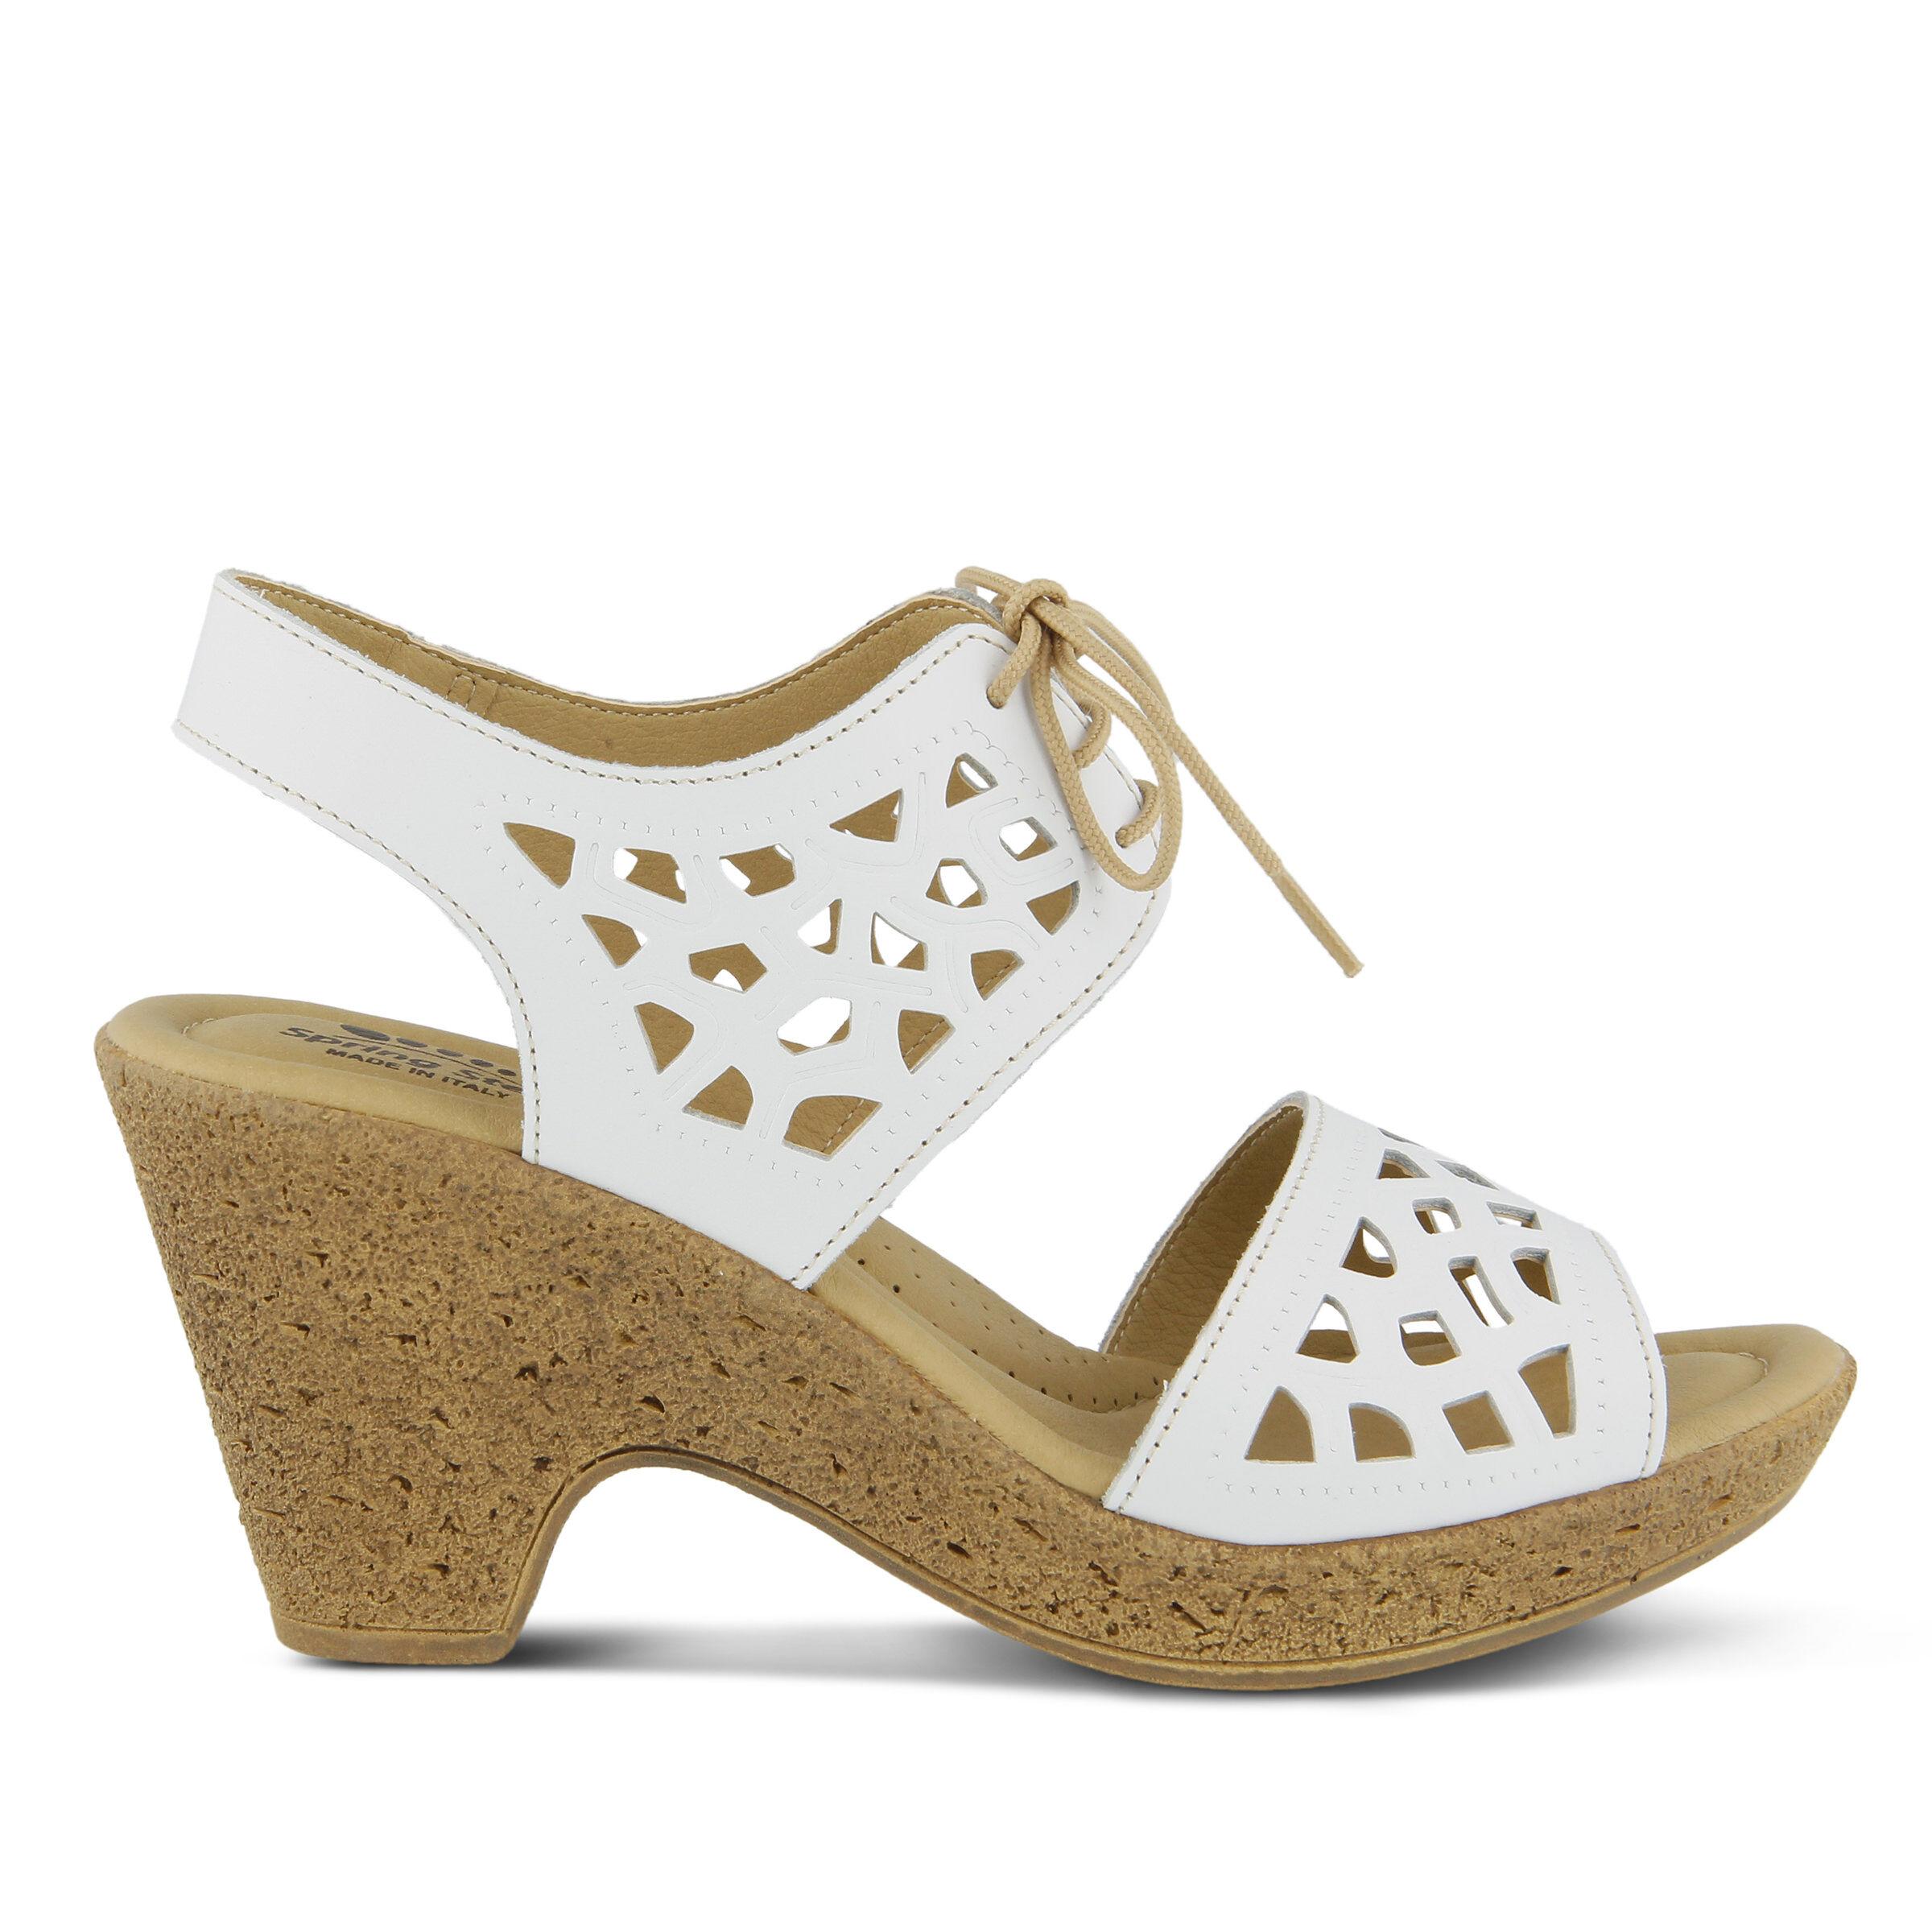 Wholesale UK Women's SPRING STEP Lamay Heeled Sandals White